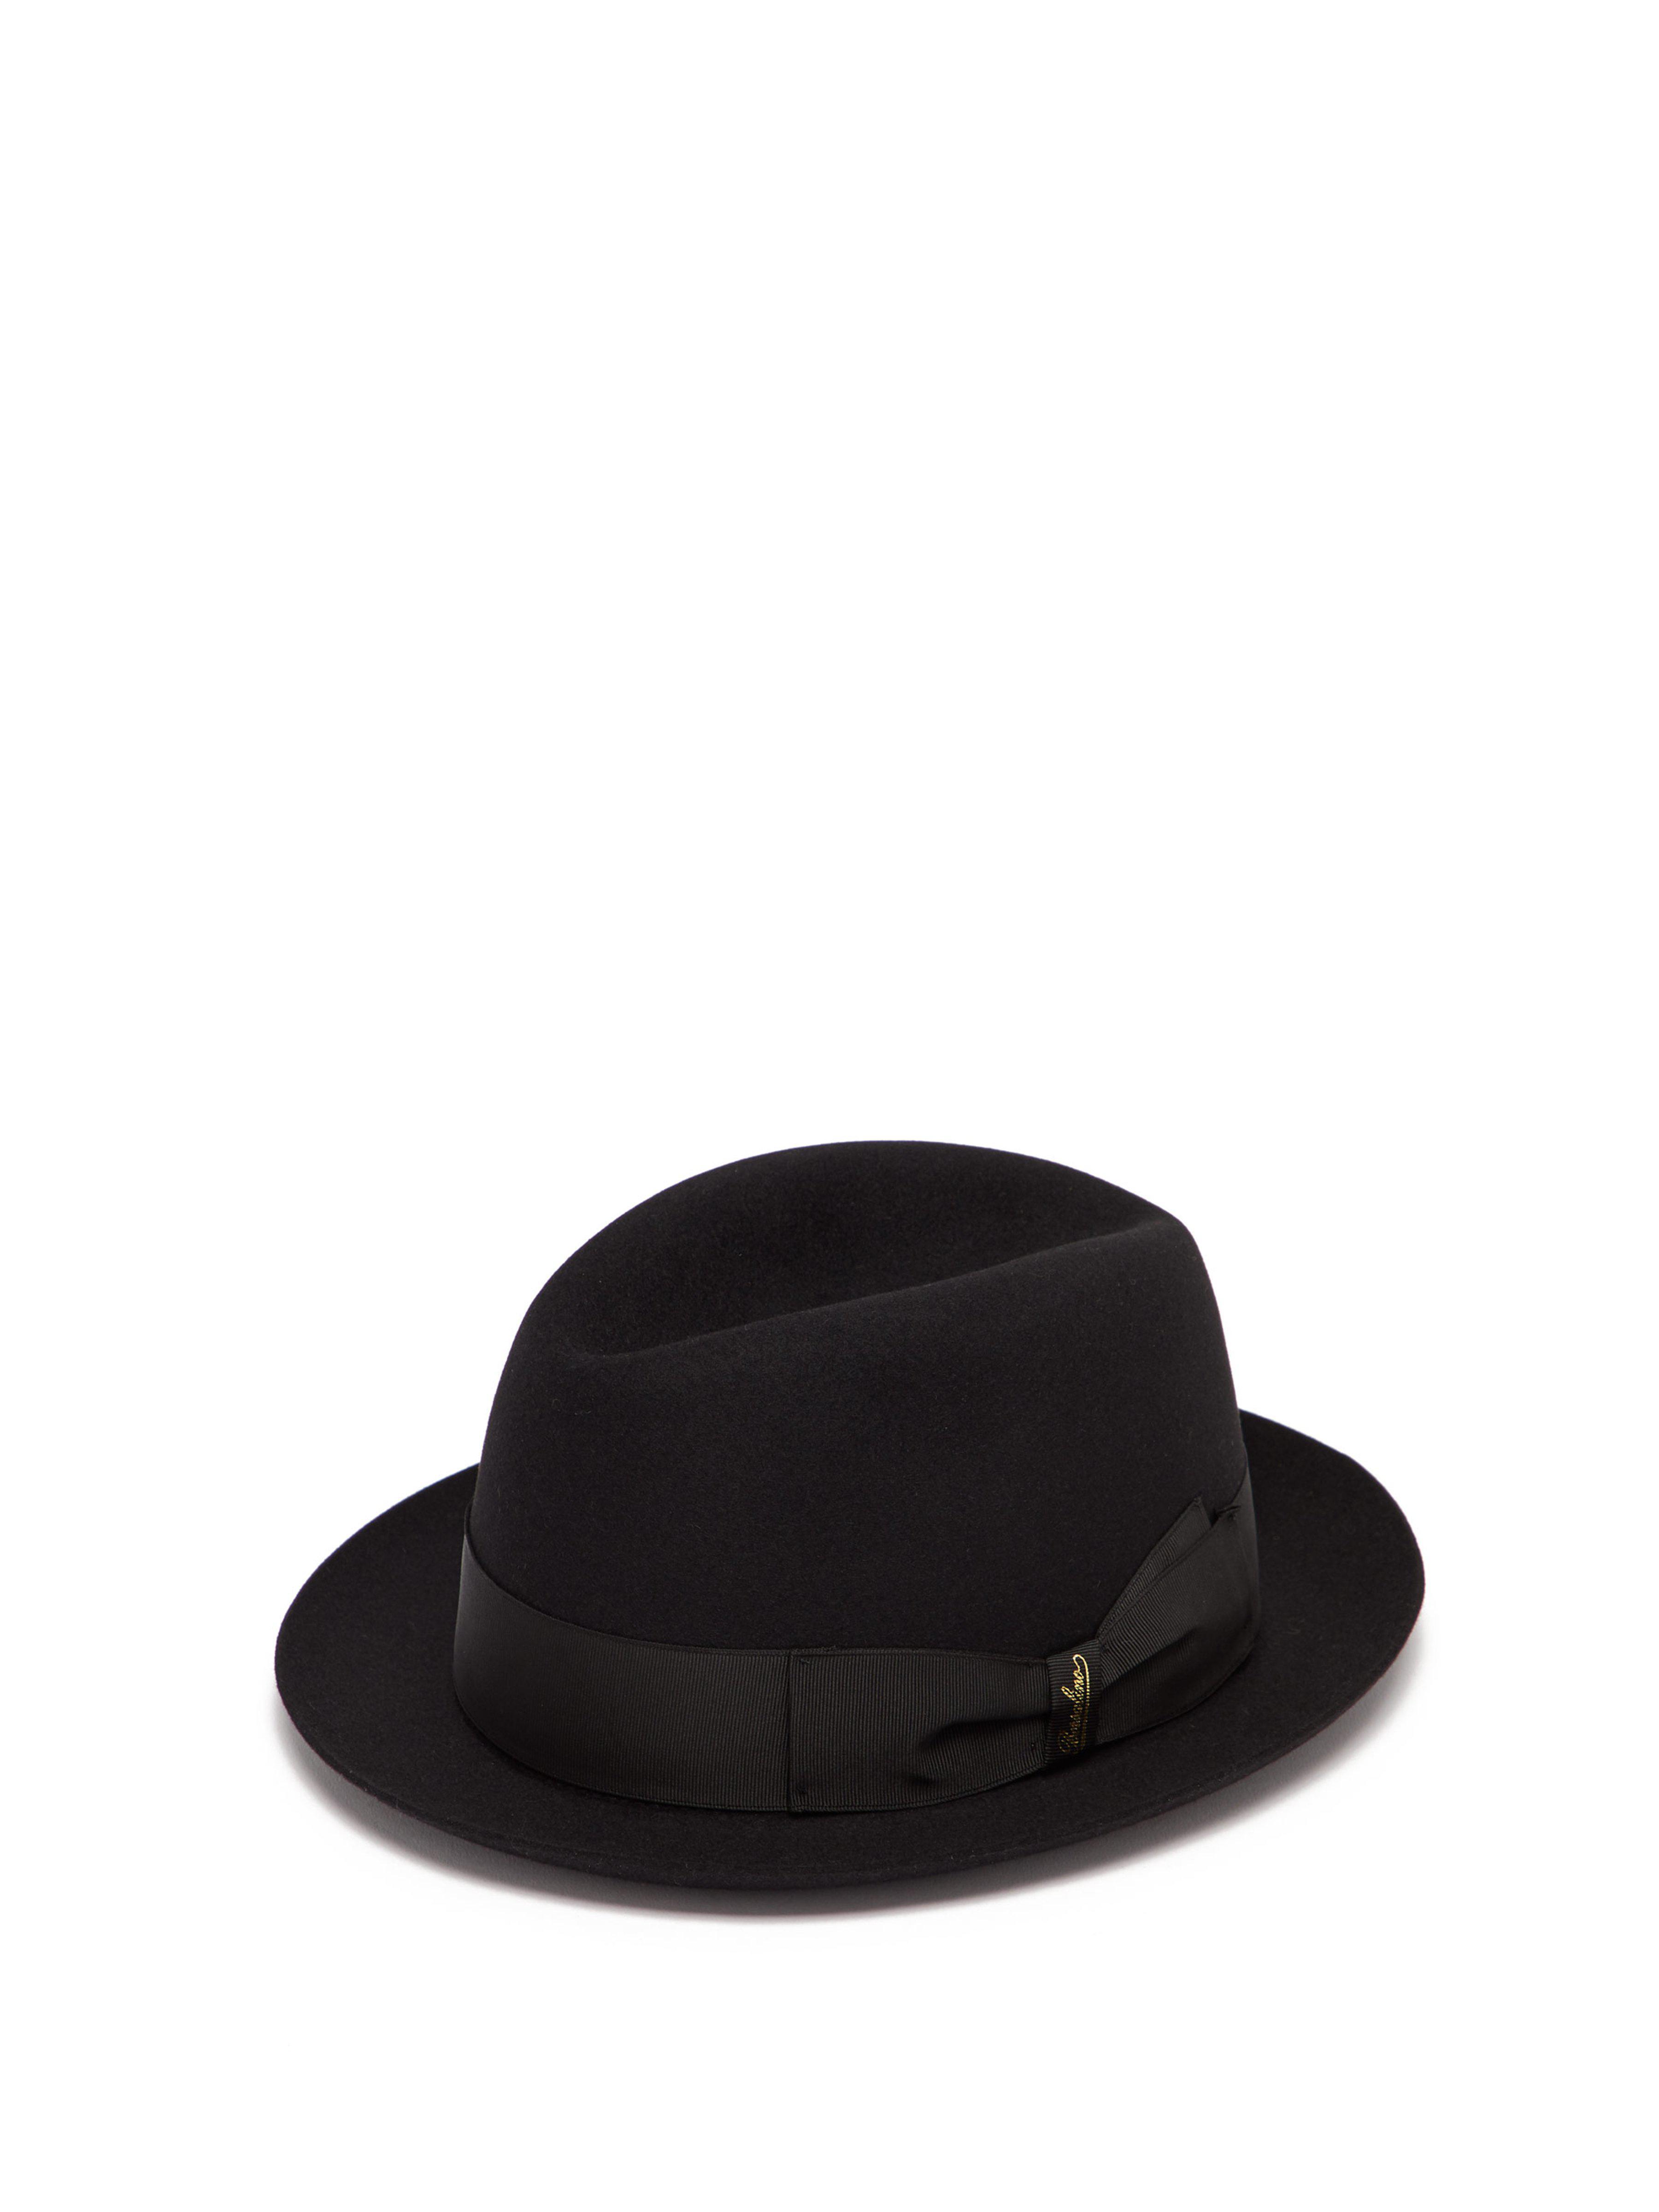 190e25d7a78 Borsalino Alessandria Felt Hat in Black for Men - Save 10% - Lyst